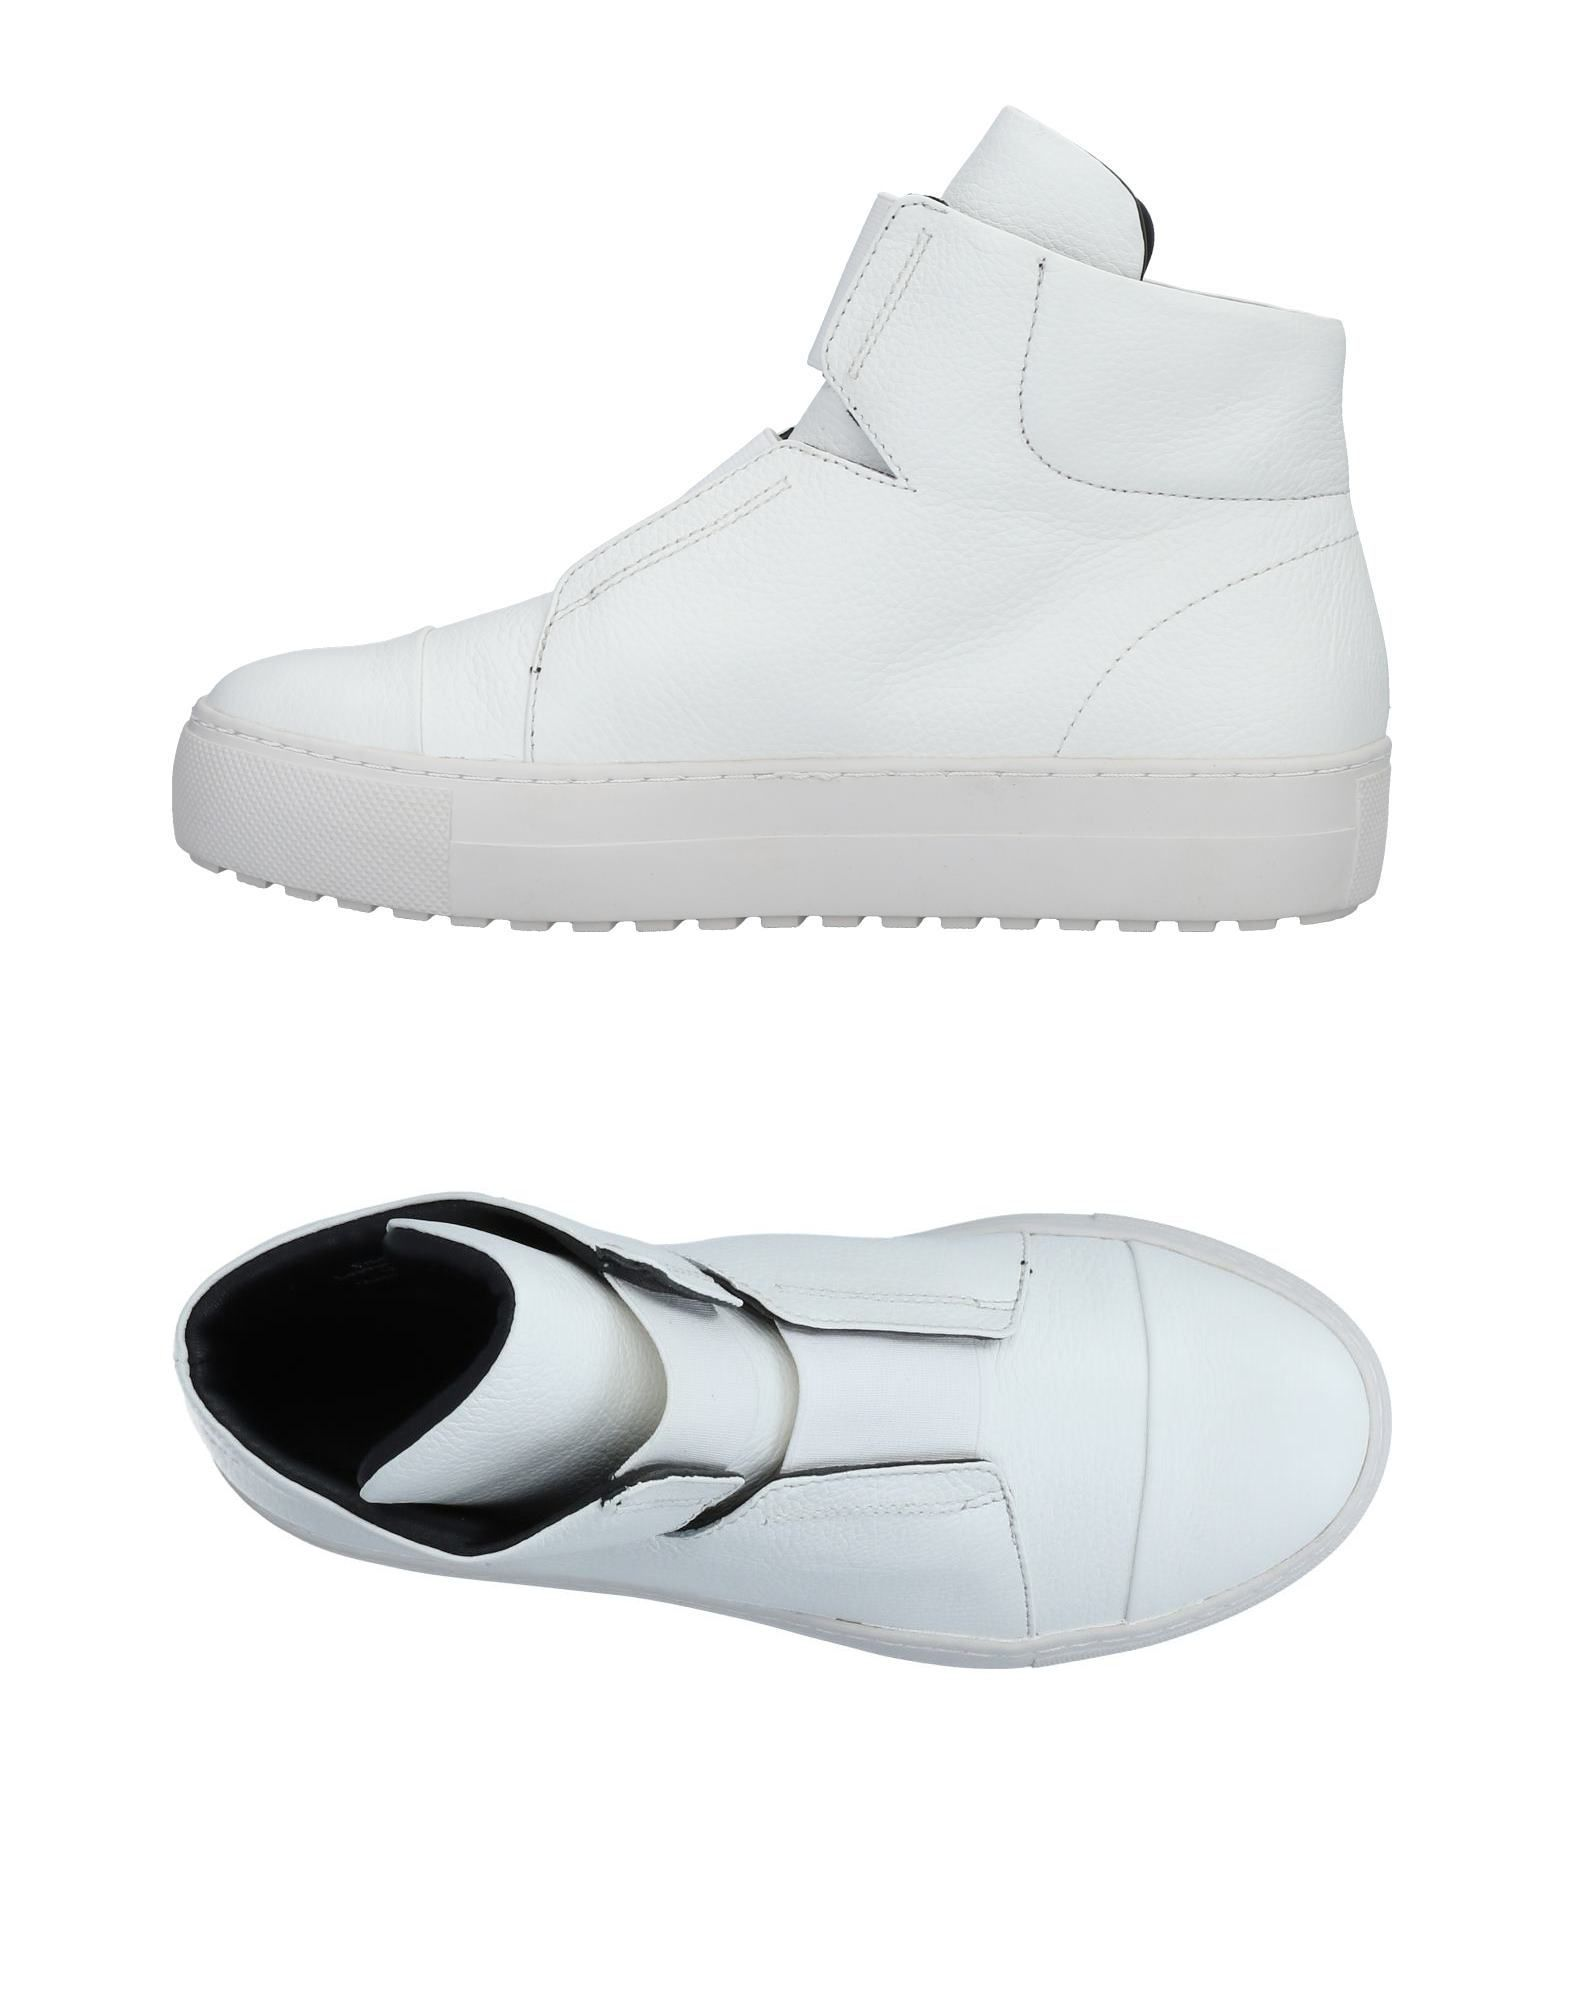 Ateljé 71 Sneakers Damen  11475338HCGut aussehende strapazierfähige Schuhe